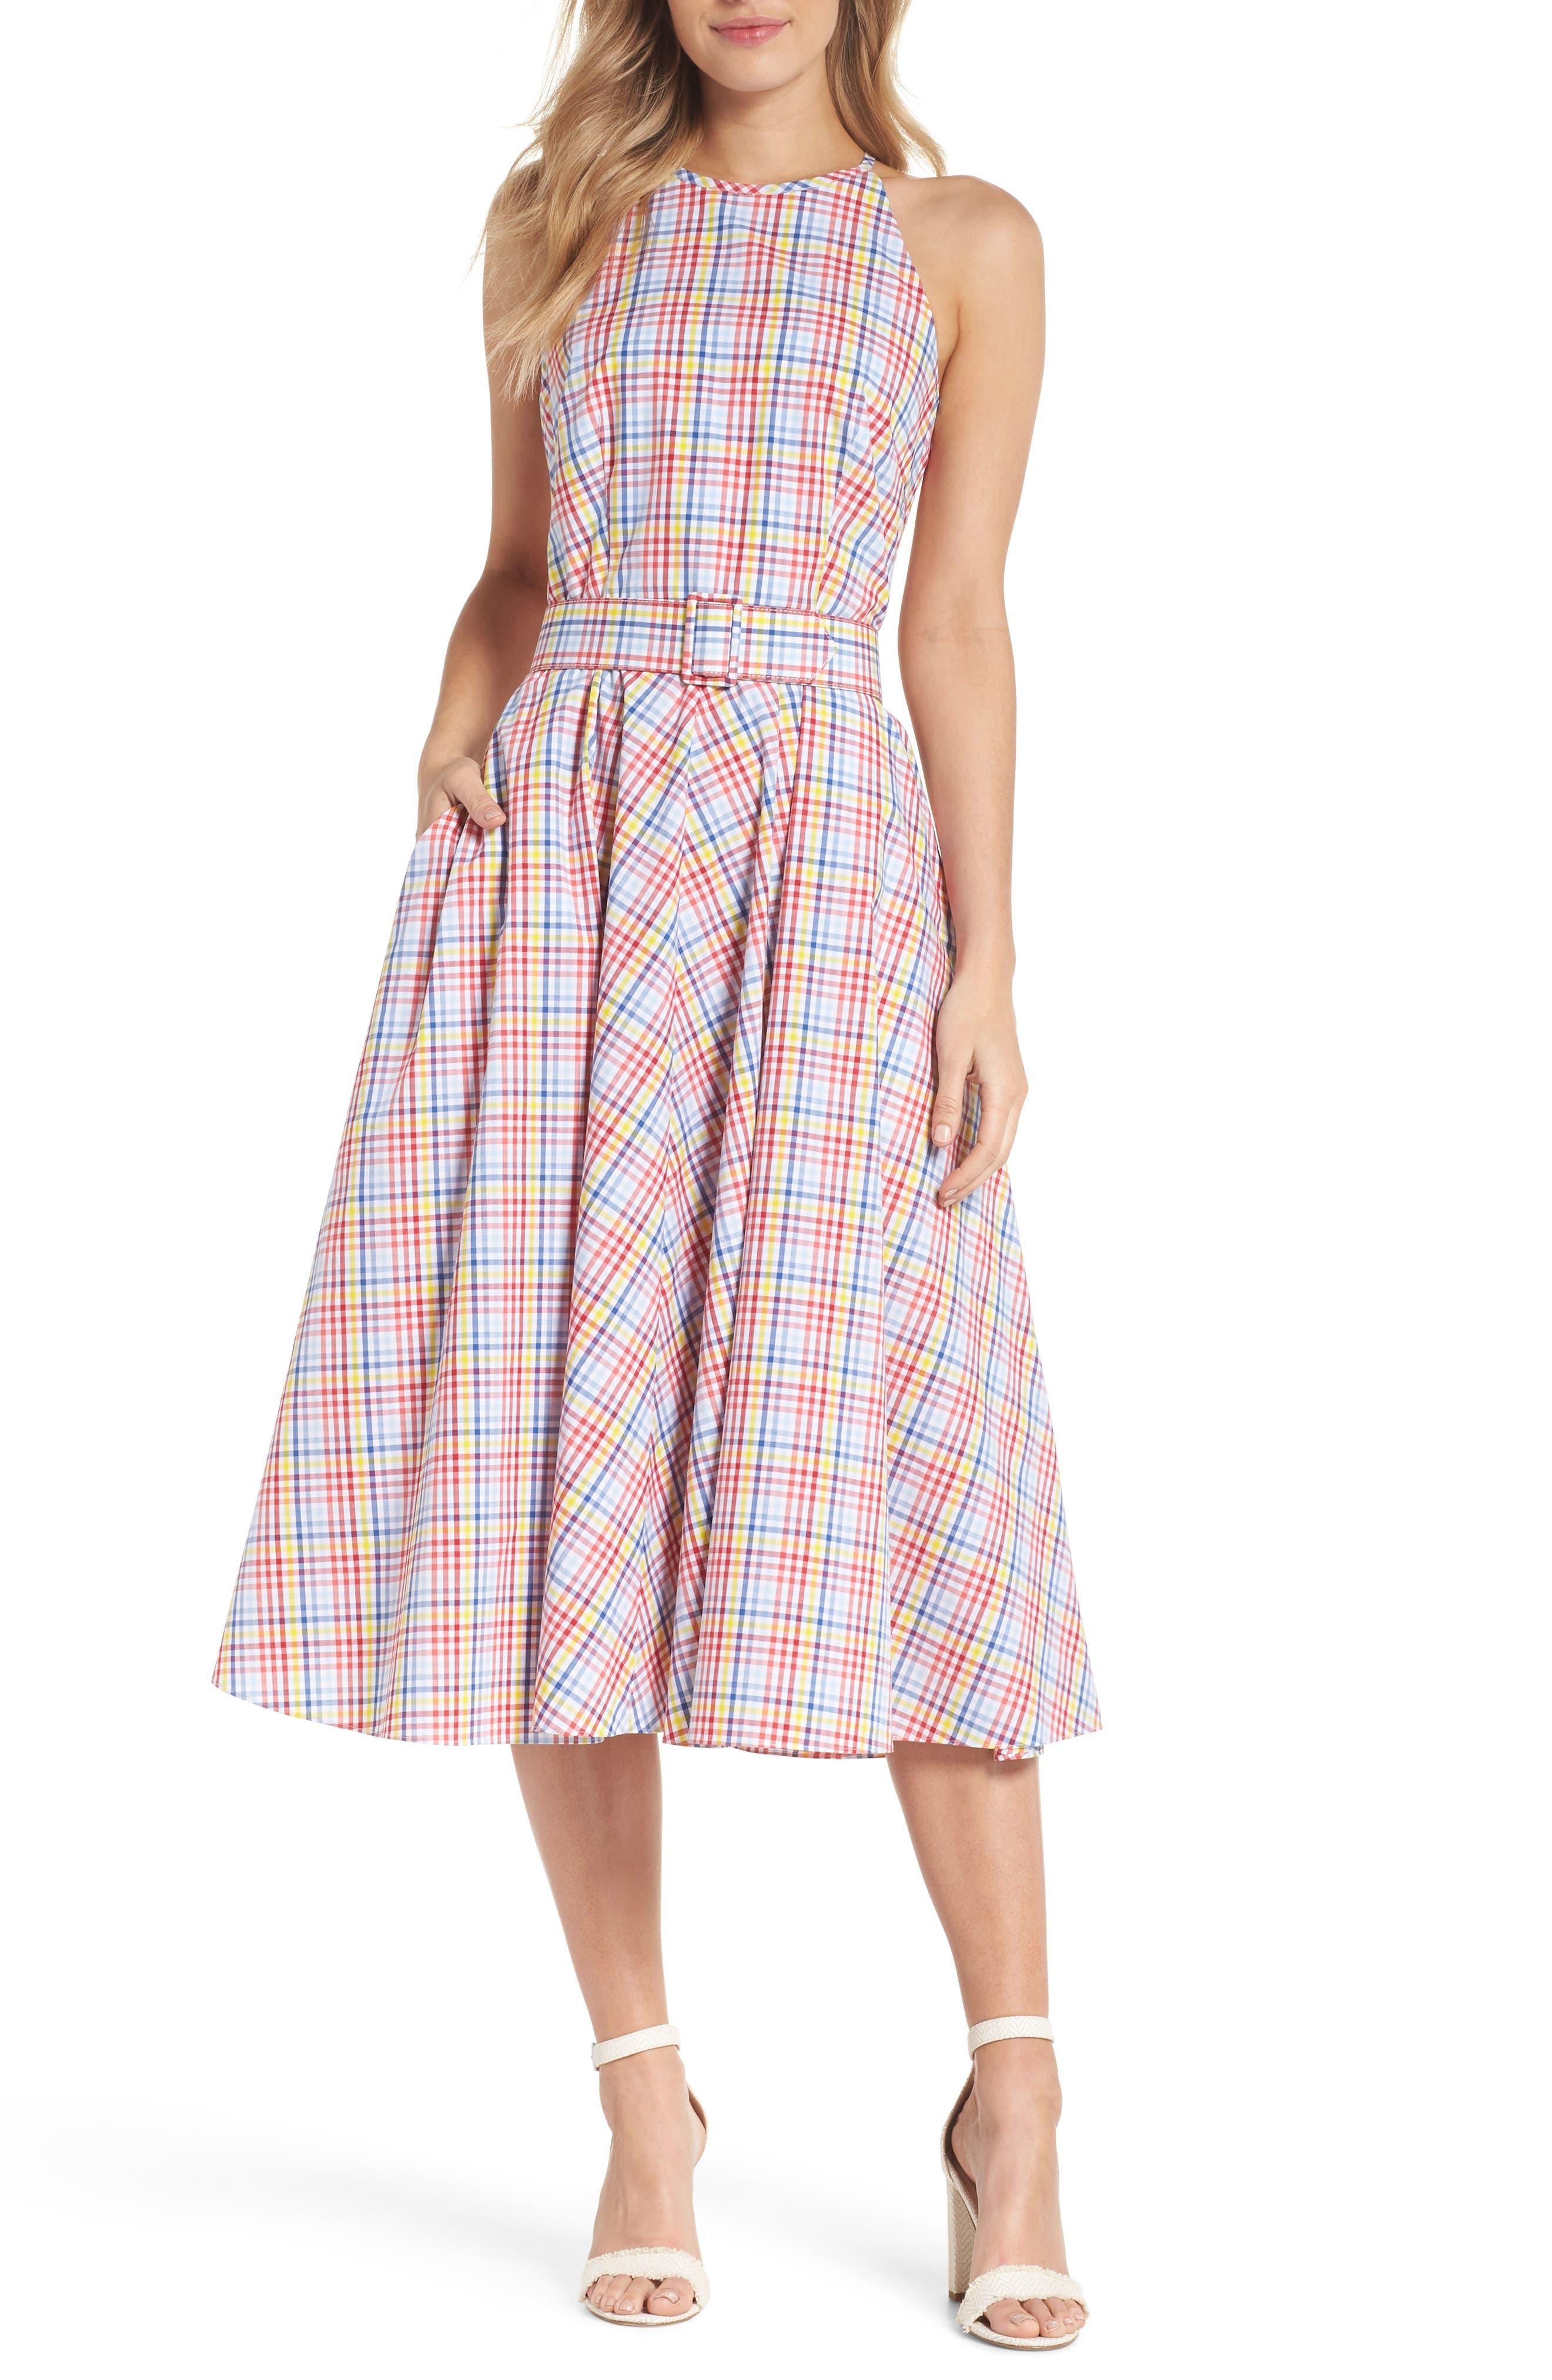 ELIZA J,                             Halter Neck Belted Cotton Sundress,                             Main thumbnail 1, color,                             610